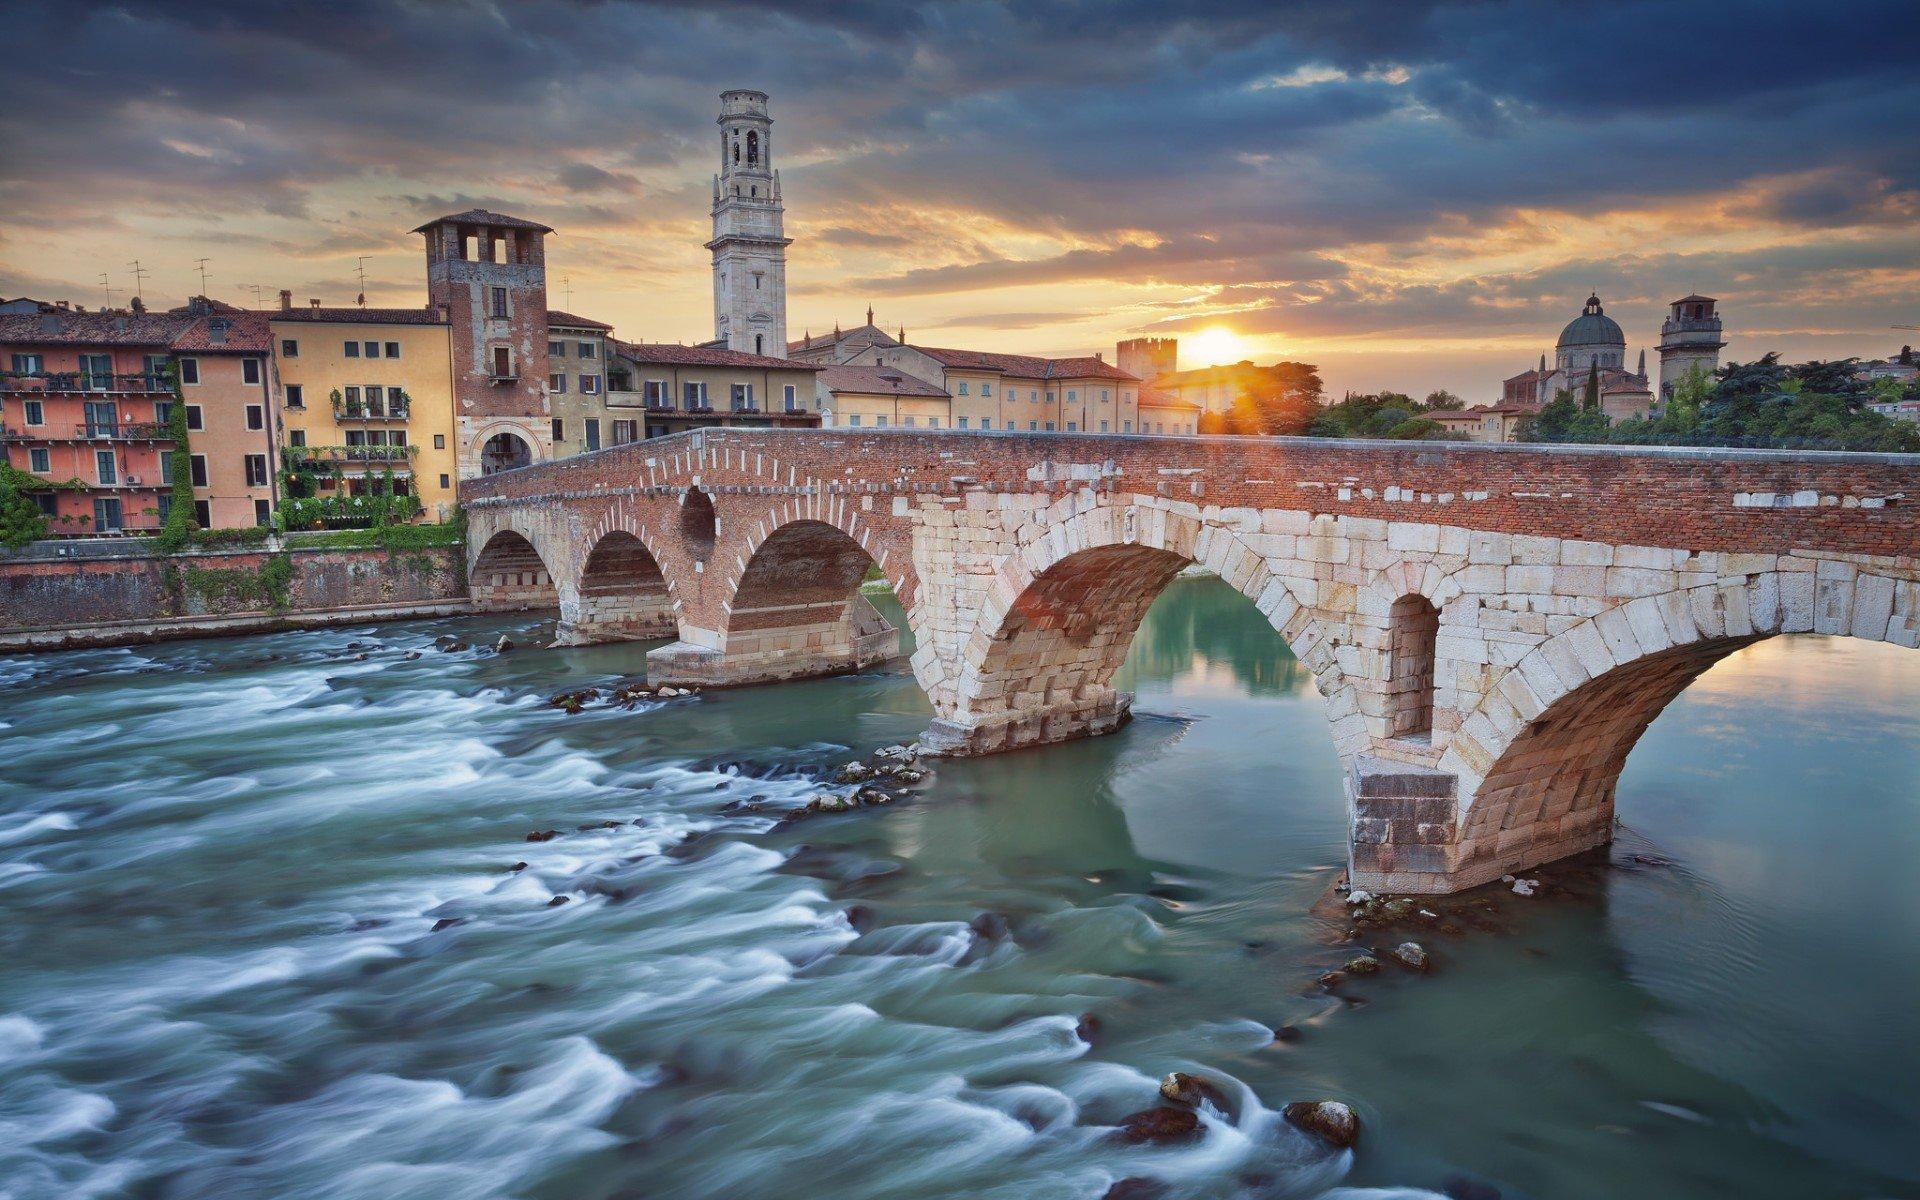 Free Download Desktop Wallpaper Hd For Windows 7 Verona Italy Hd Wallpapers Desktop And Mobile Images